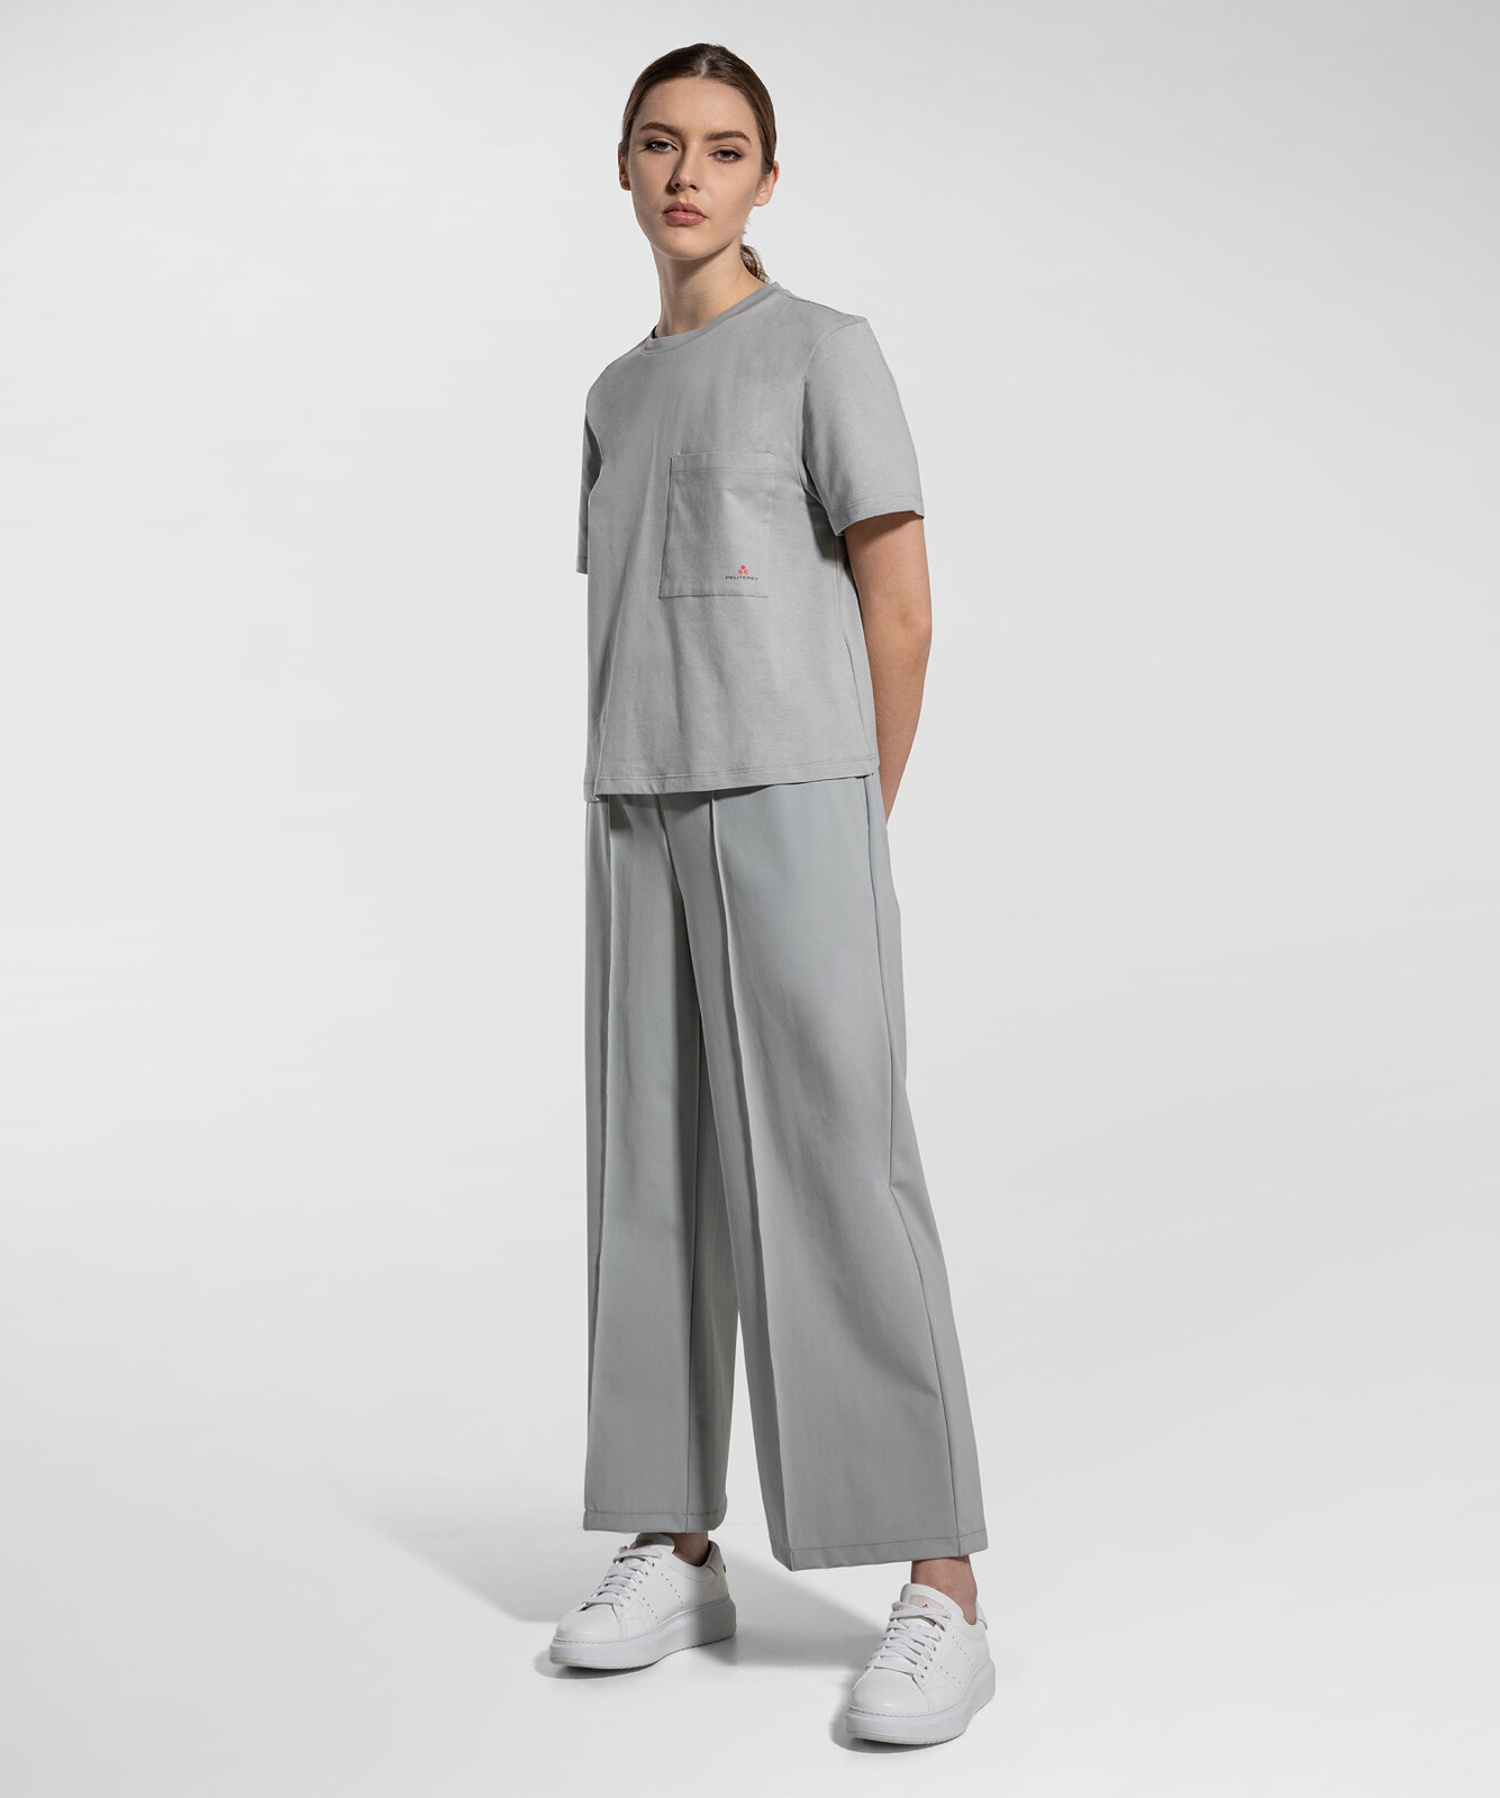 Pantaloni Cropped E Tecnici - Peuterey